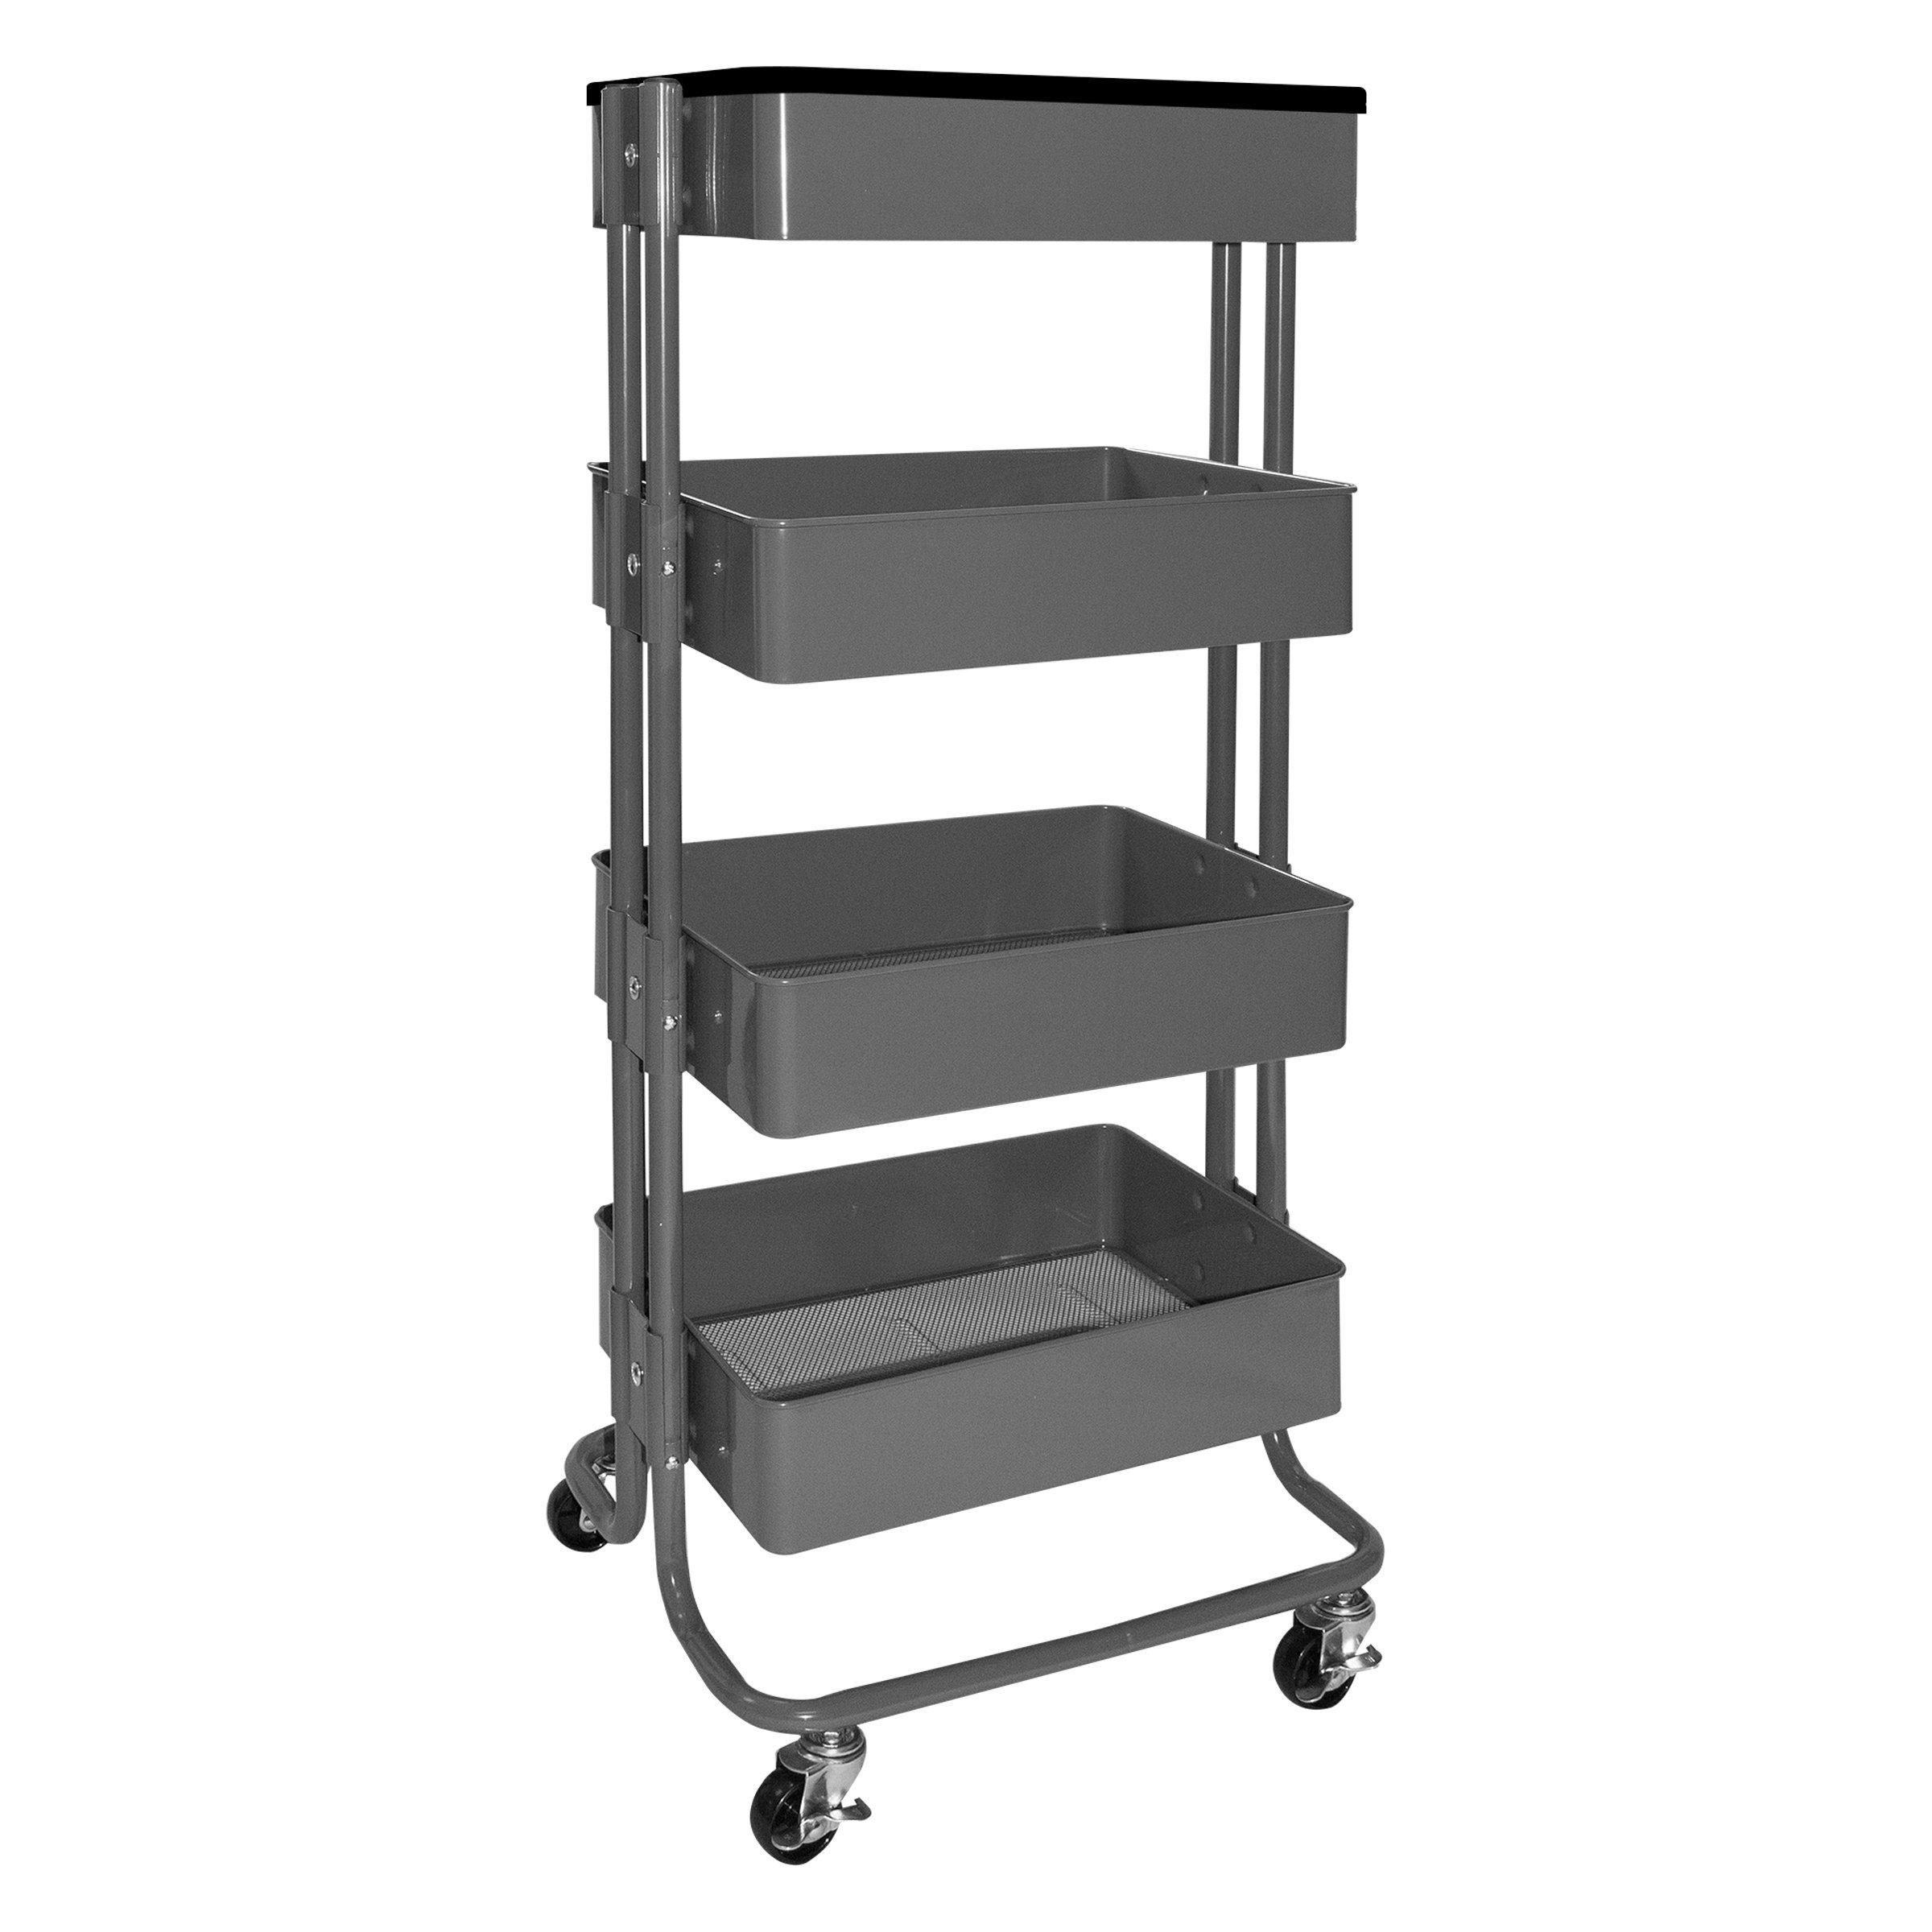 Vertiflex Stand-Up 4-Tier Workstation, 39'' Tall, Gray (VF51025)